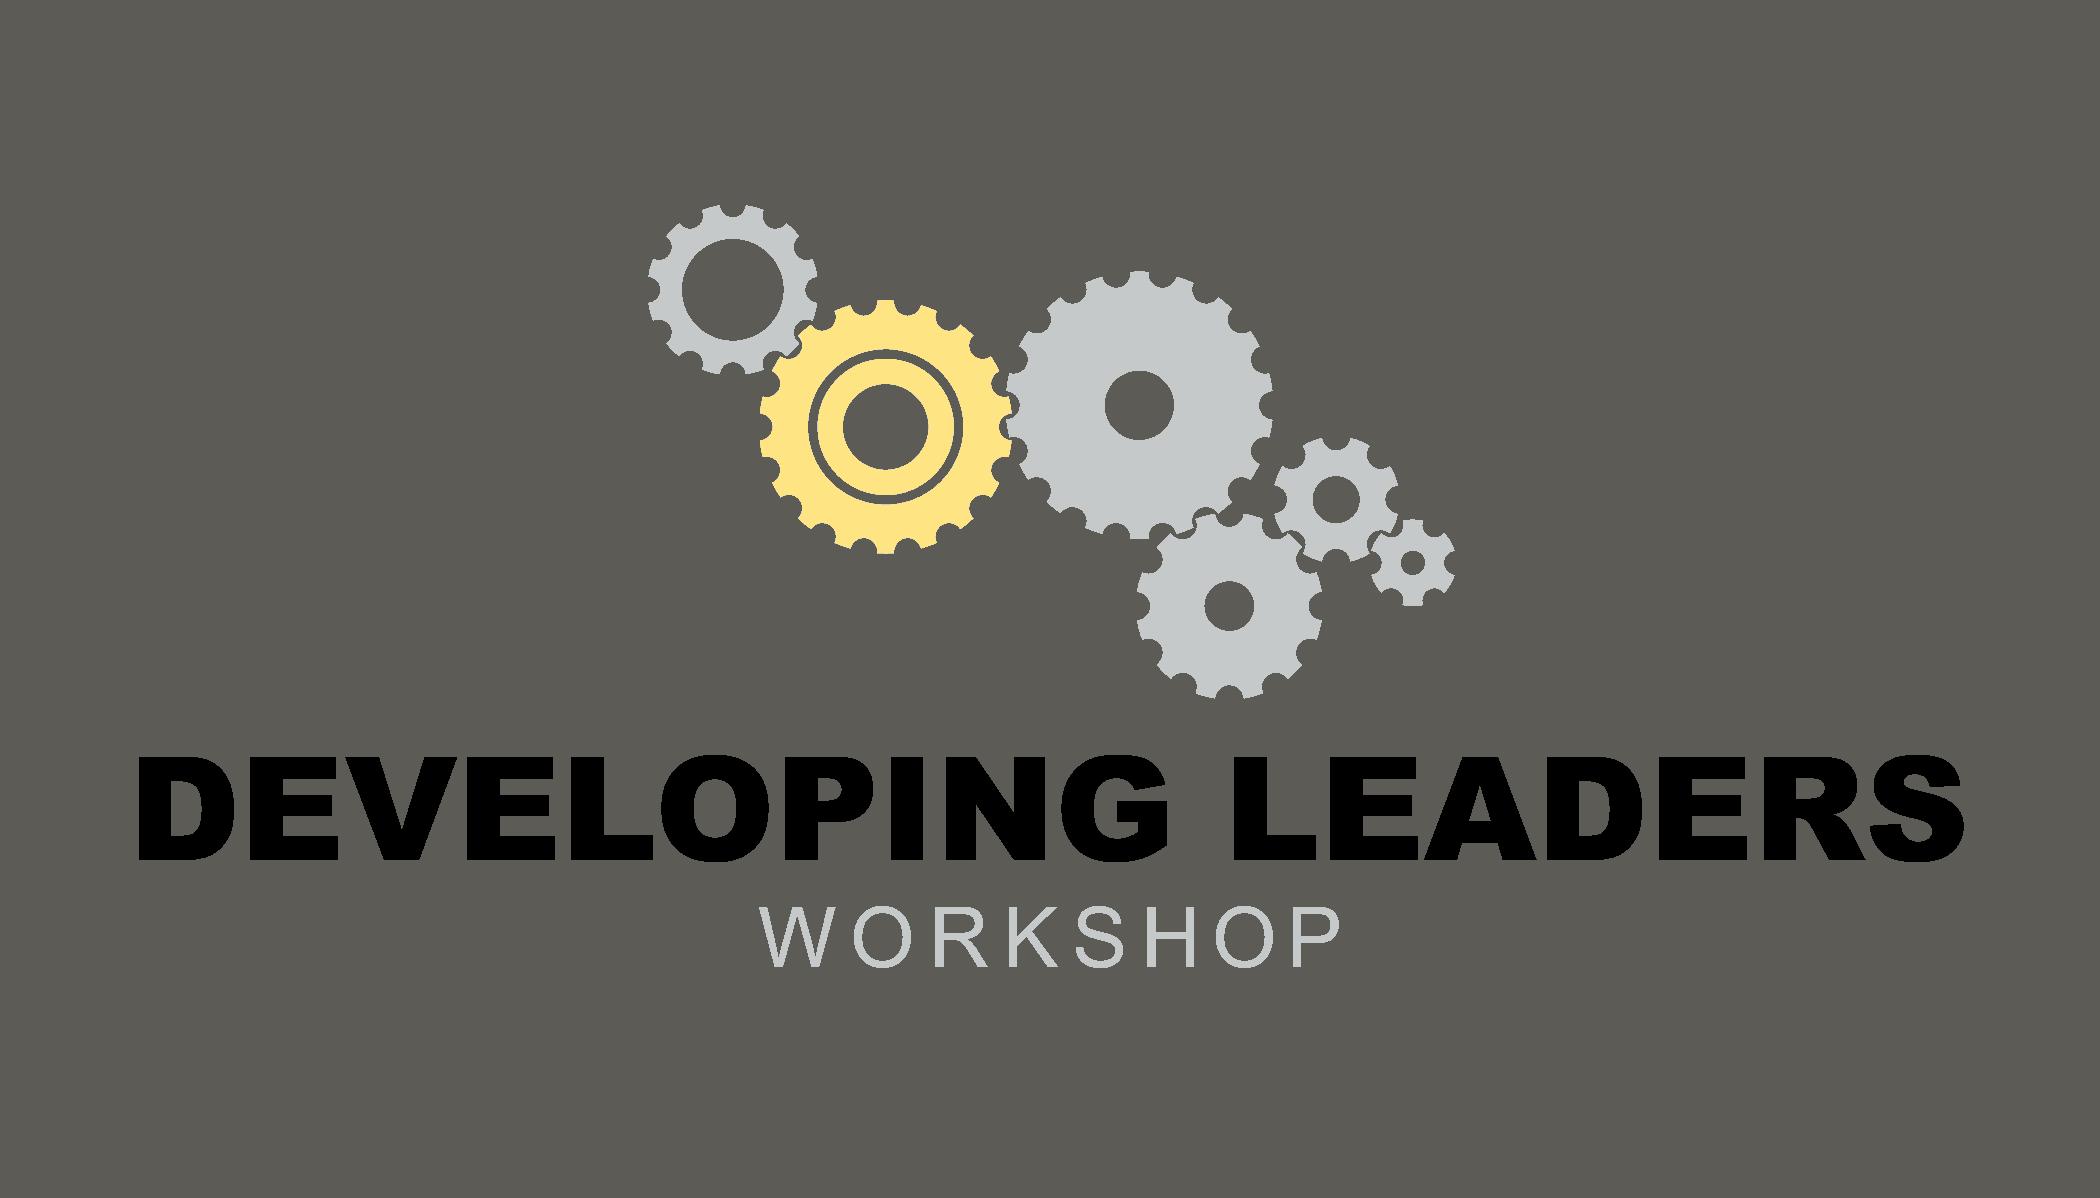 Developing leaders logo